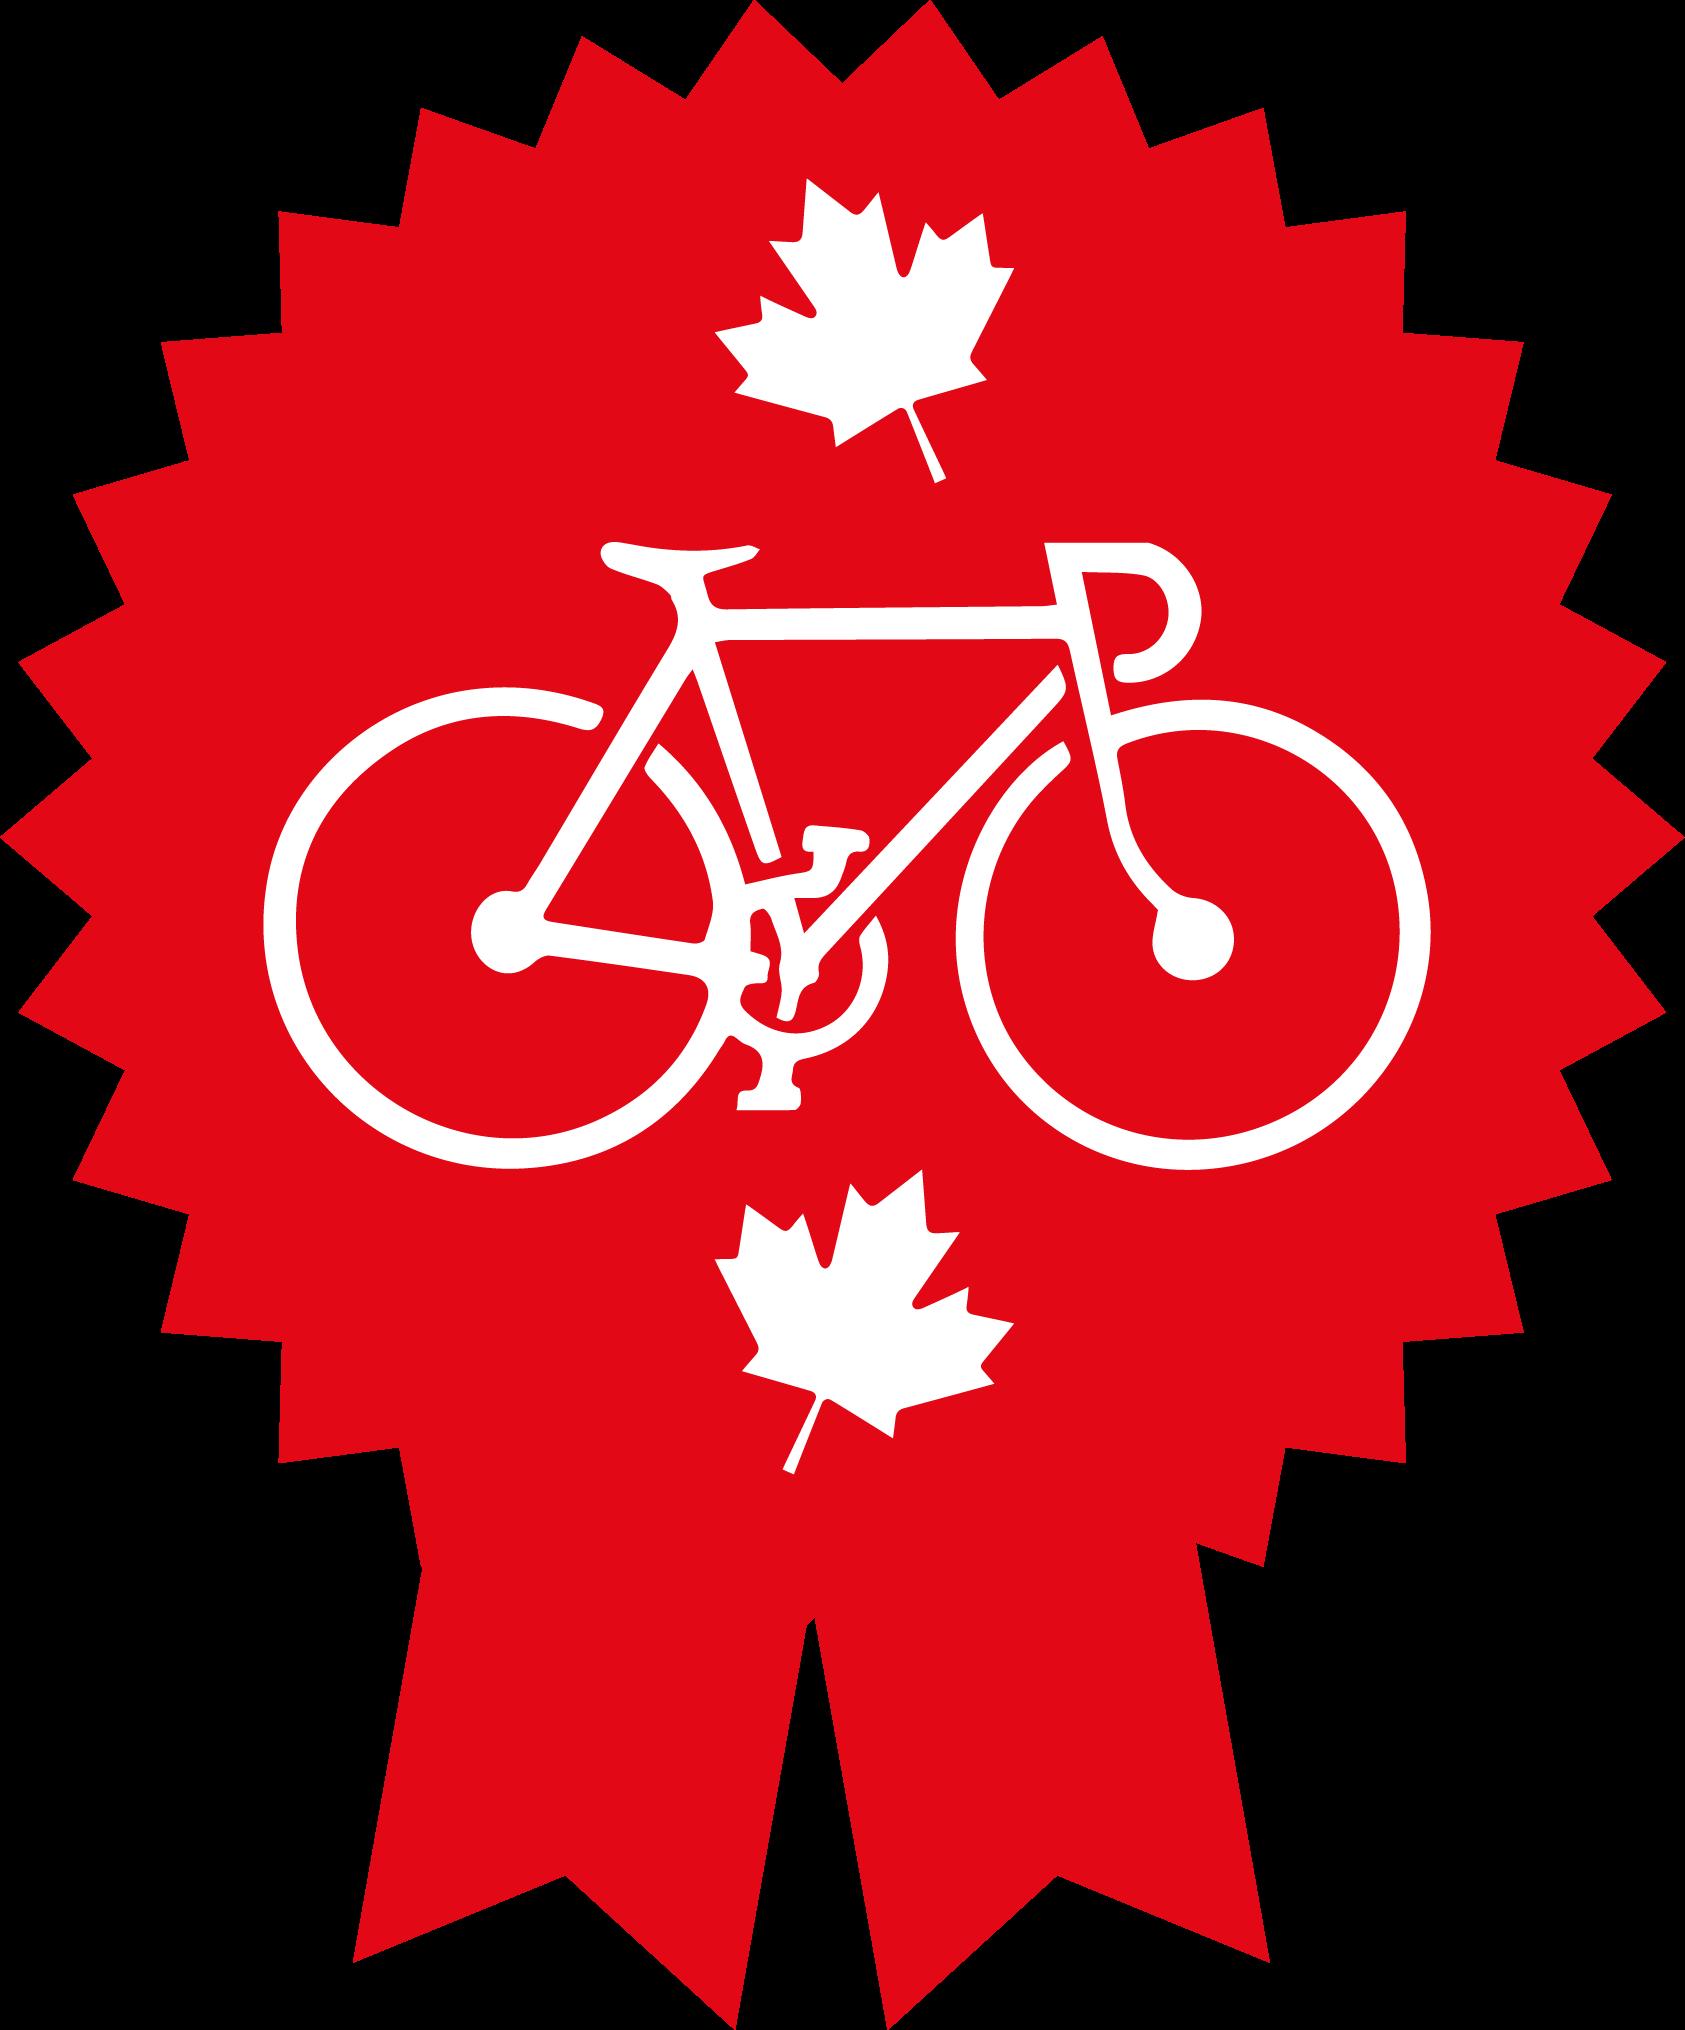 Nicks Cycling challenge sponsors